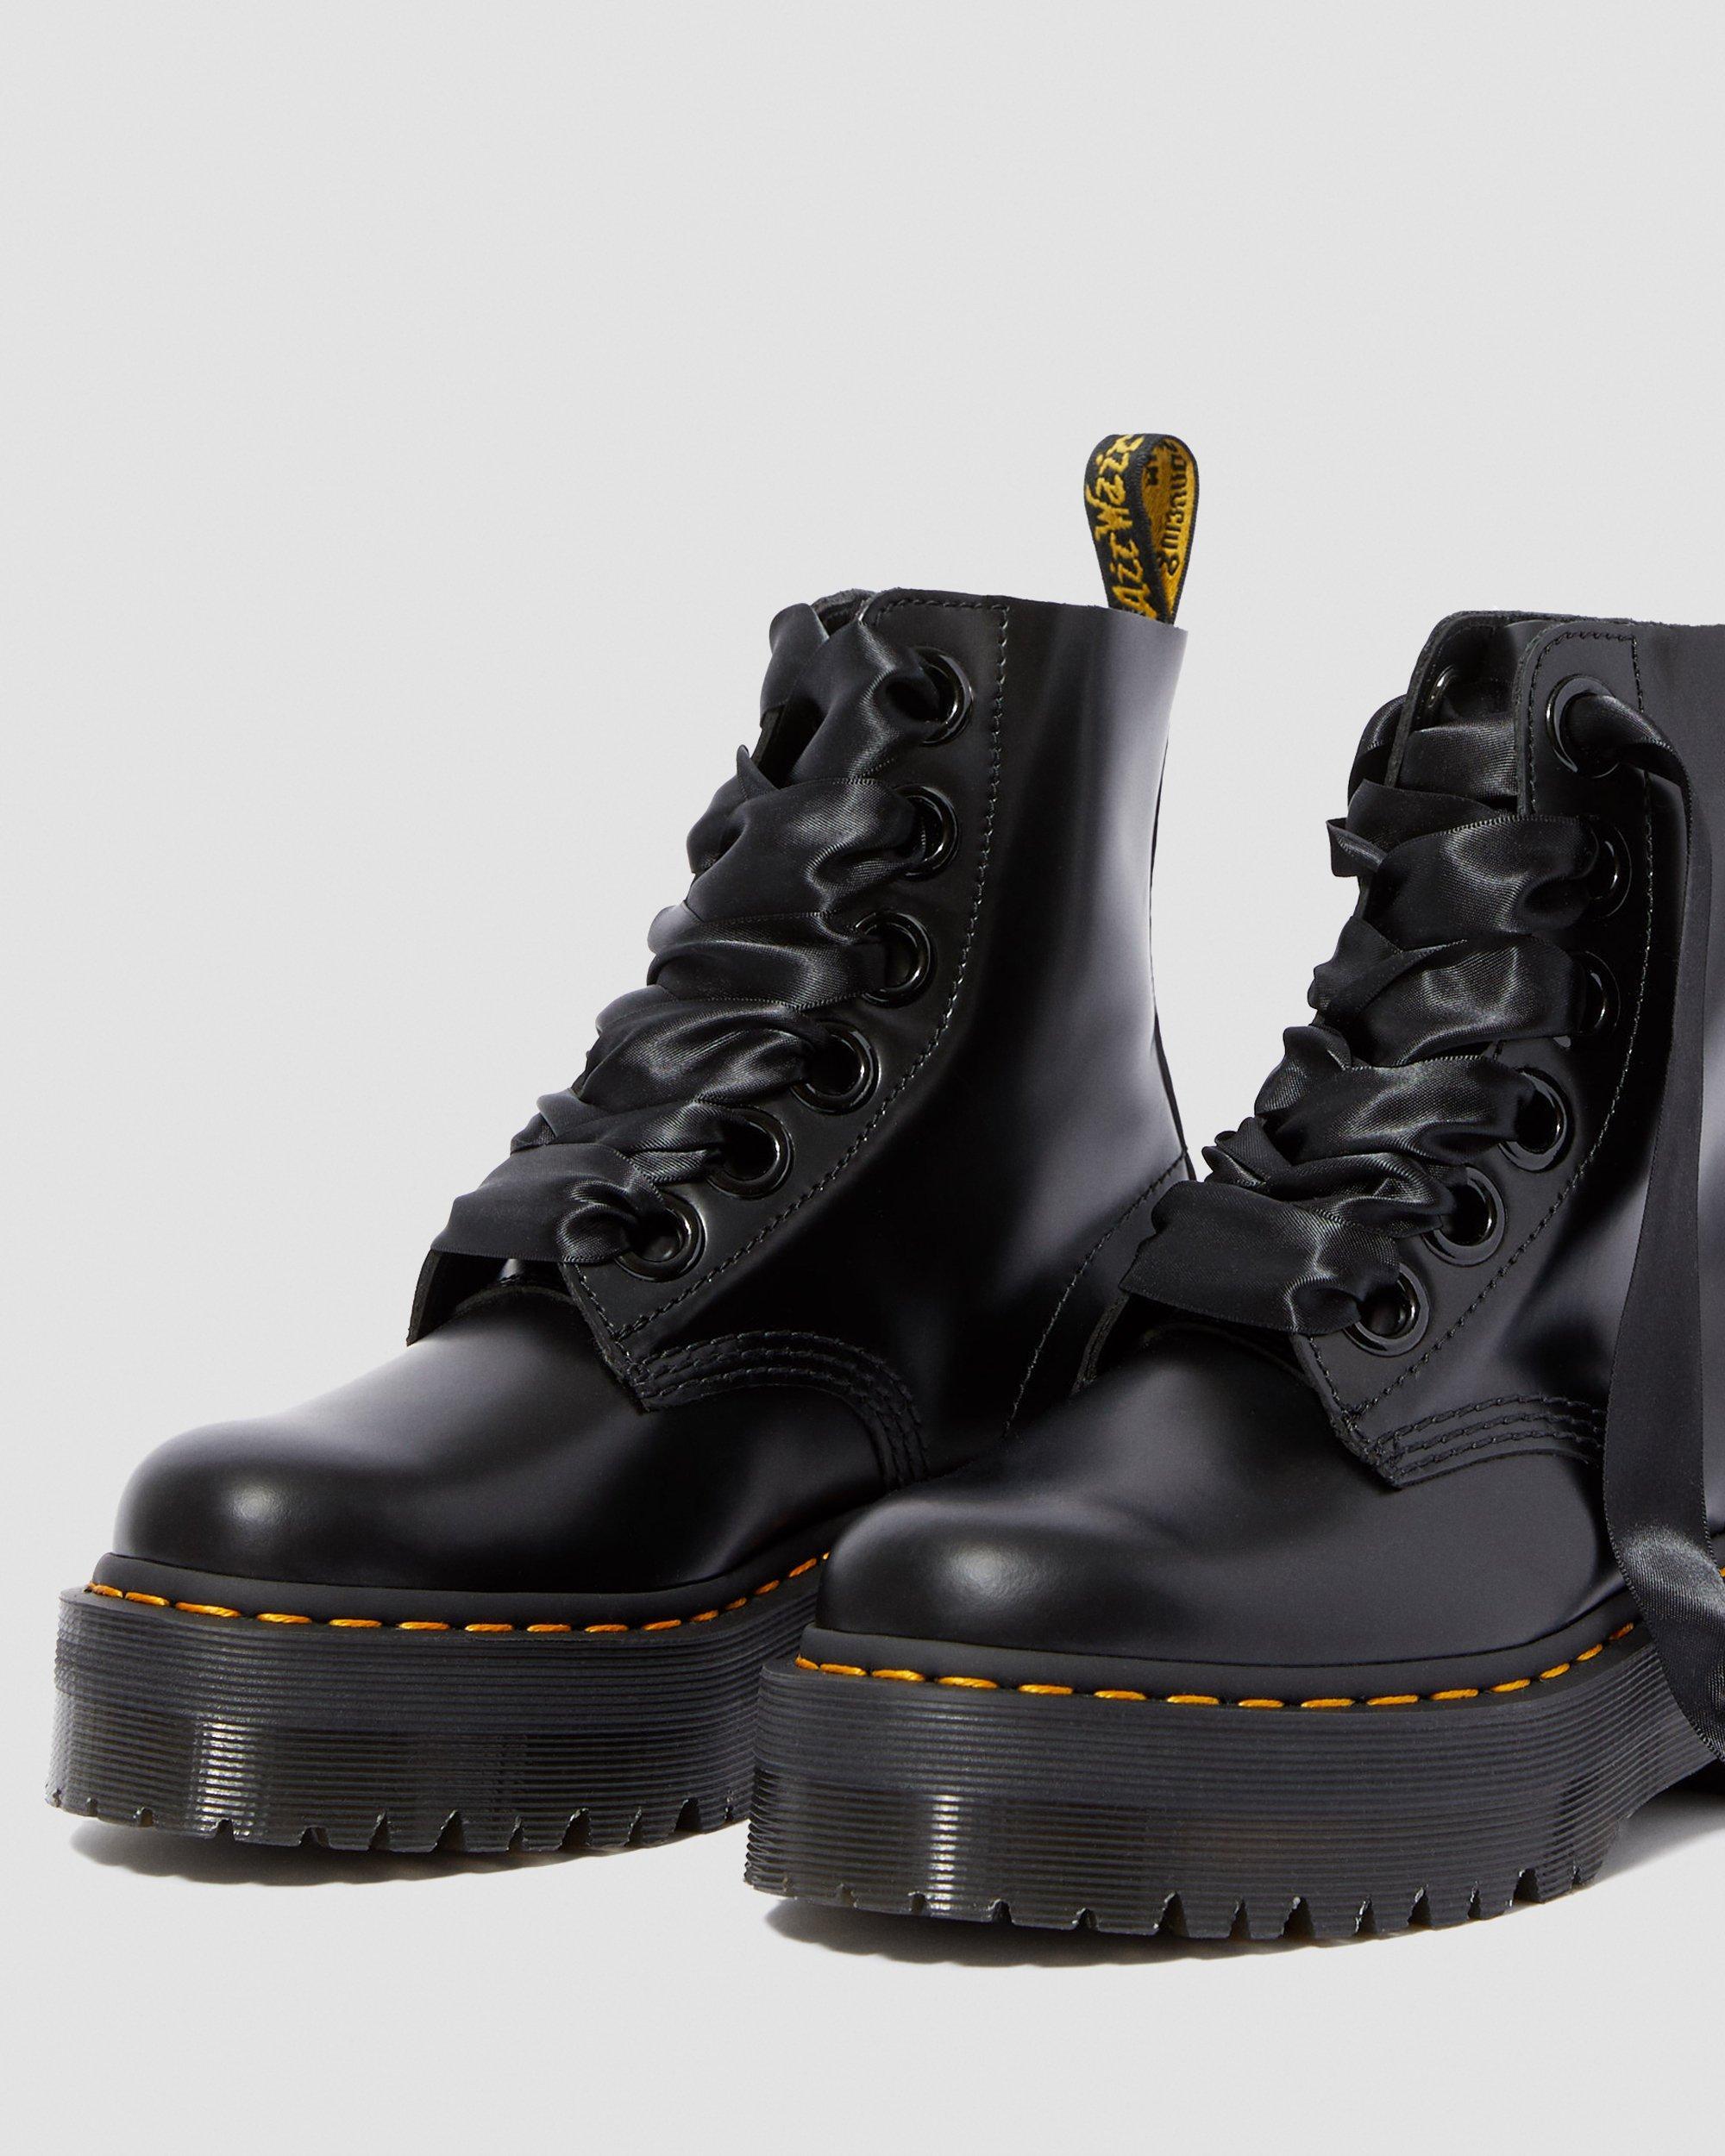 dr martens pascal lace up boot black buttero exclusive, Dr